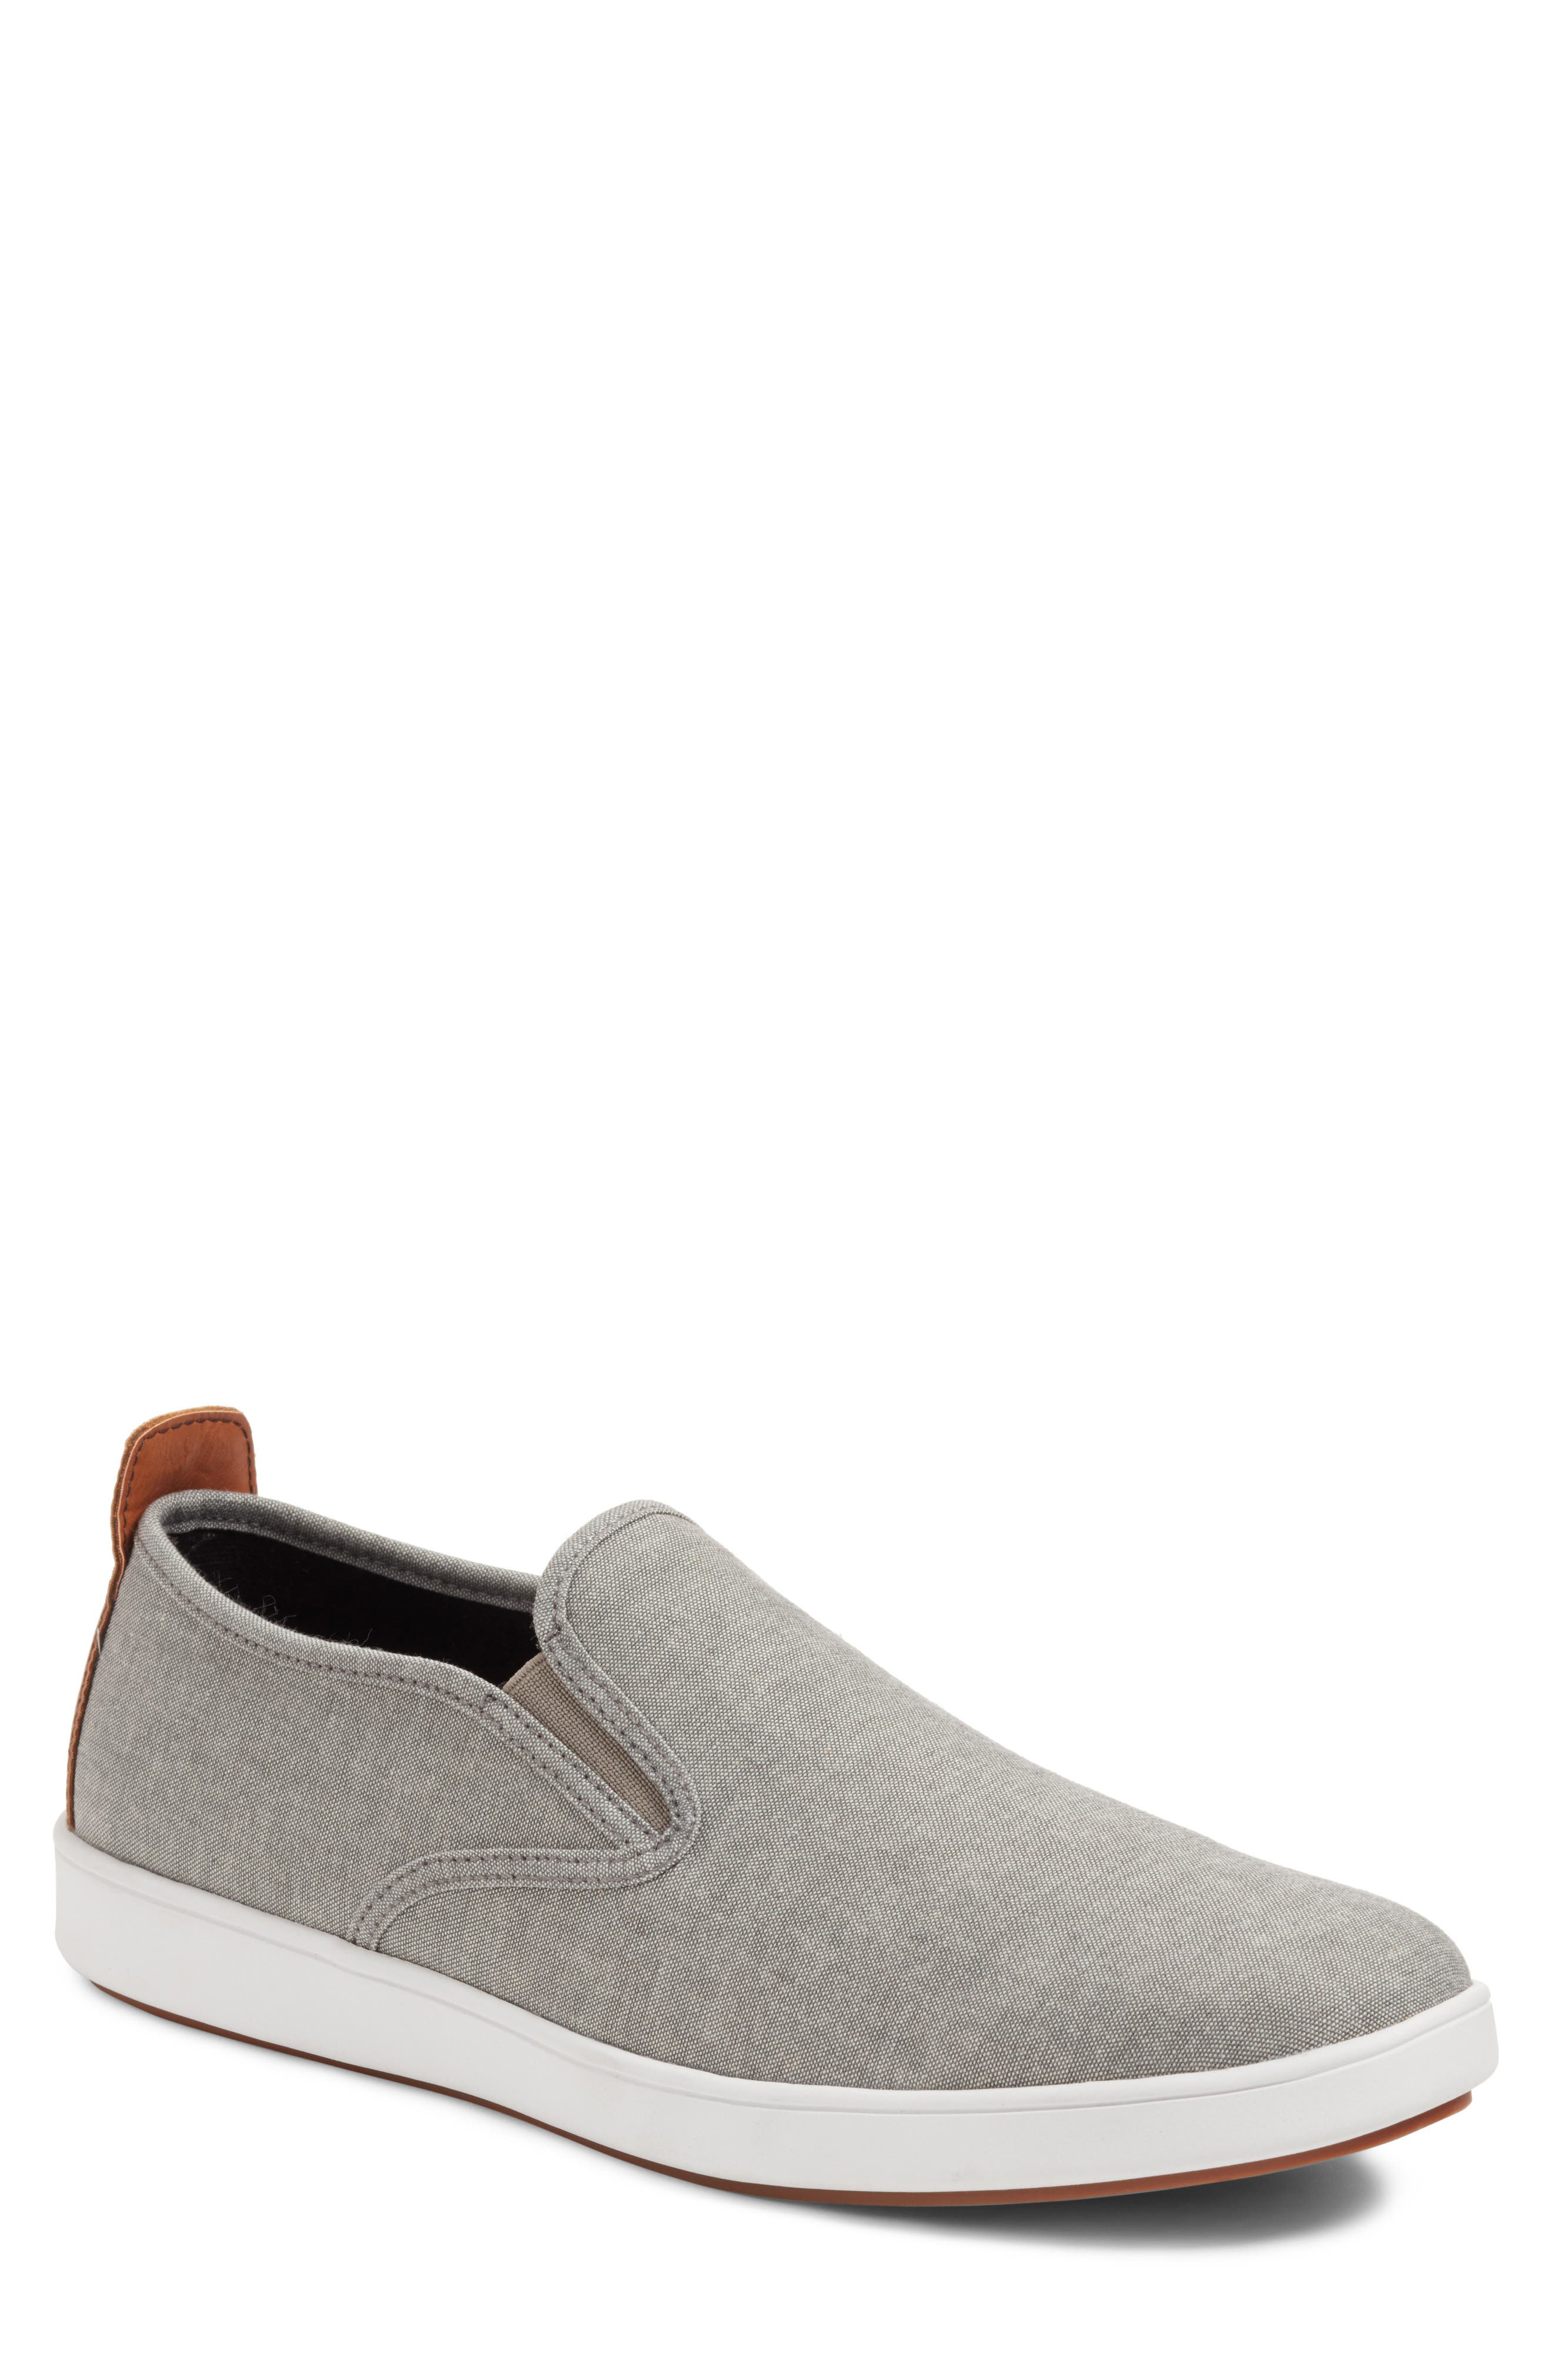 Felix Slip-On Sneaker,                             Main thumbnail 1, color,                             Grey